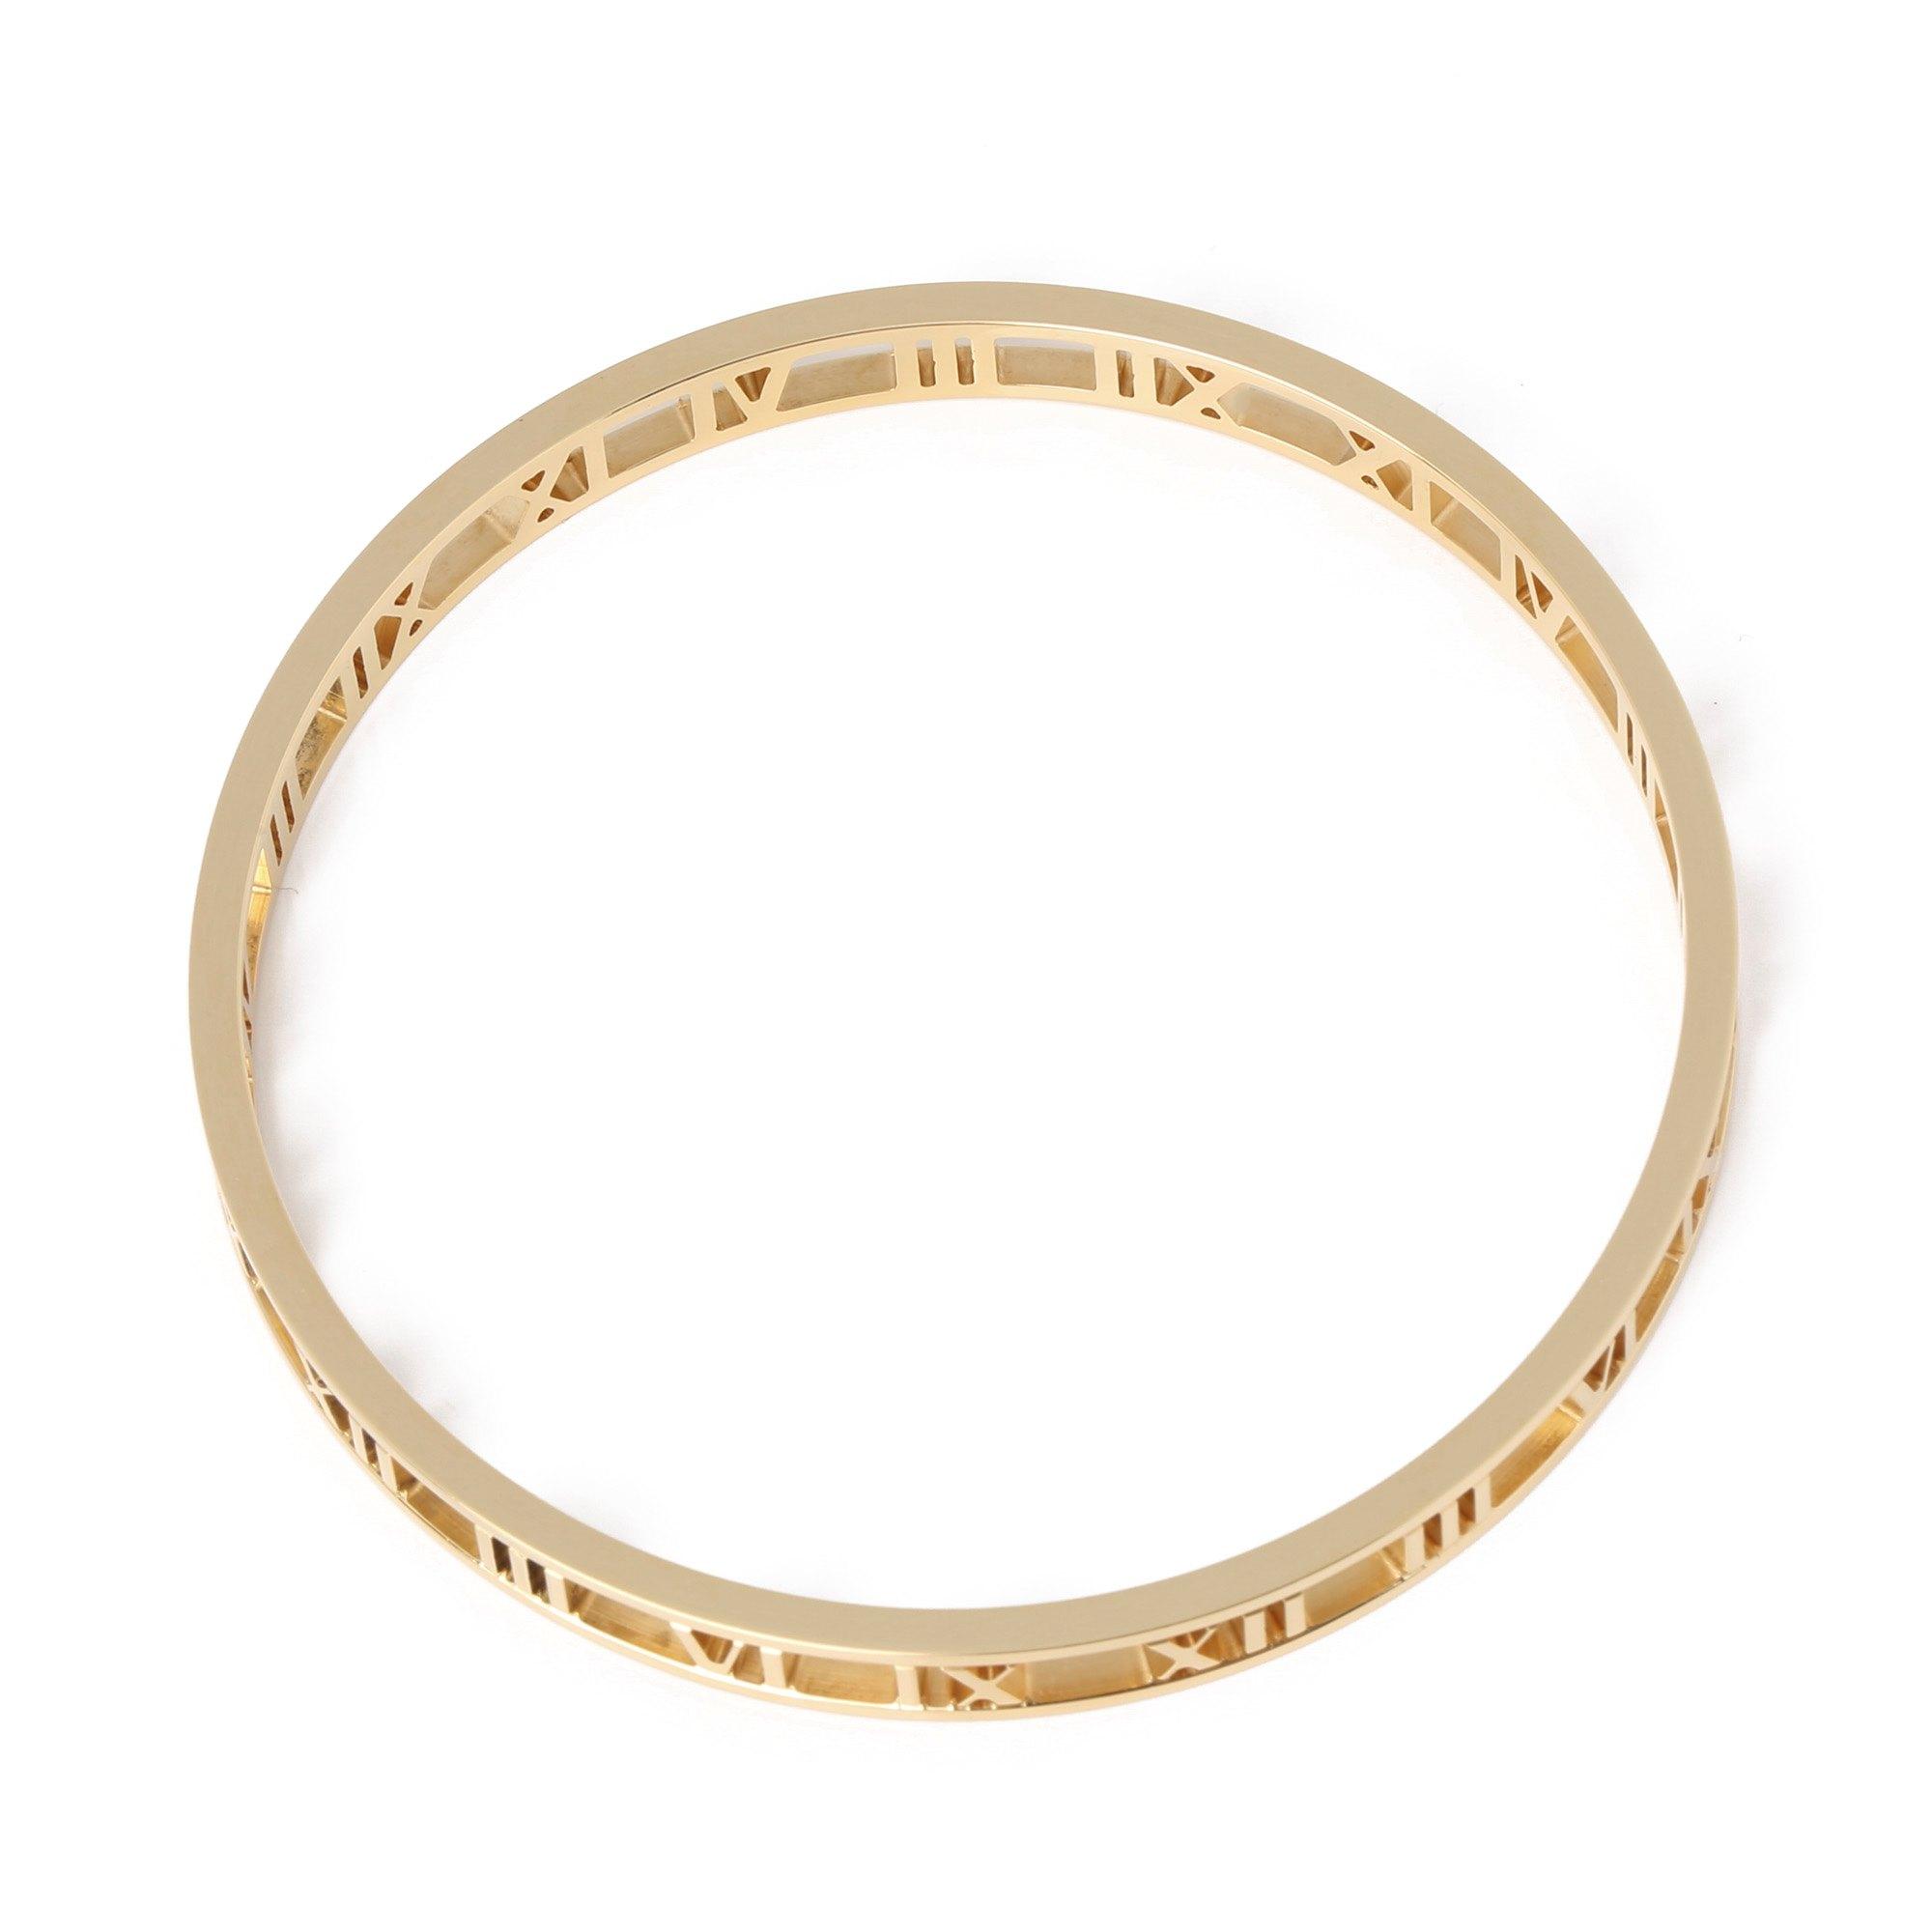 Tiffany & Co. Atlas 18k yellow gold bangle